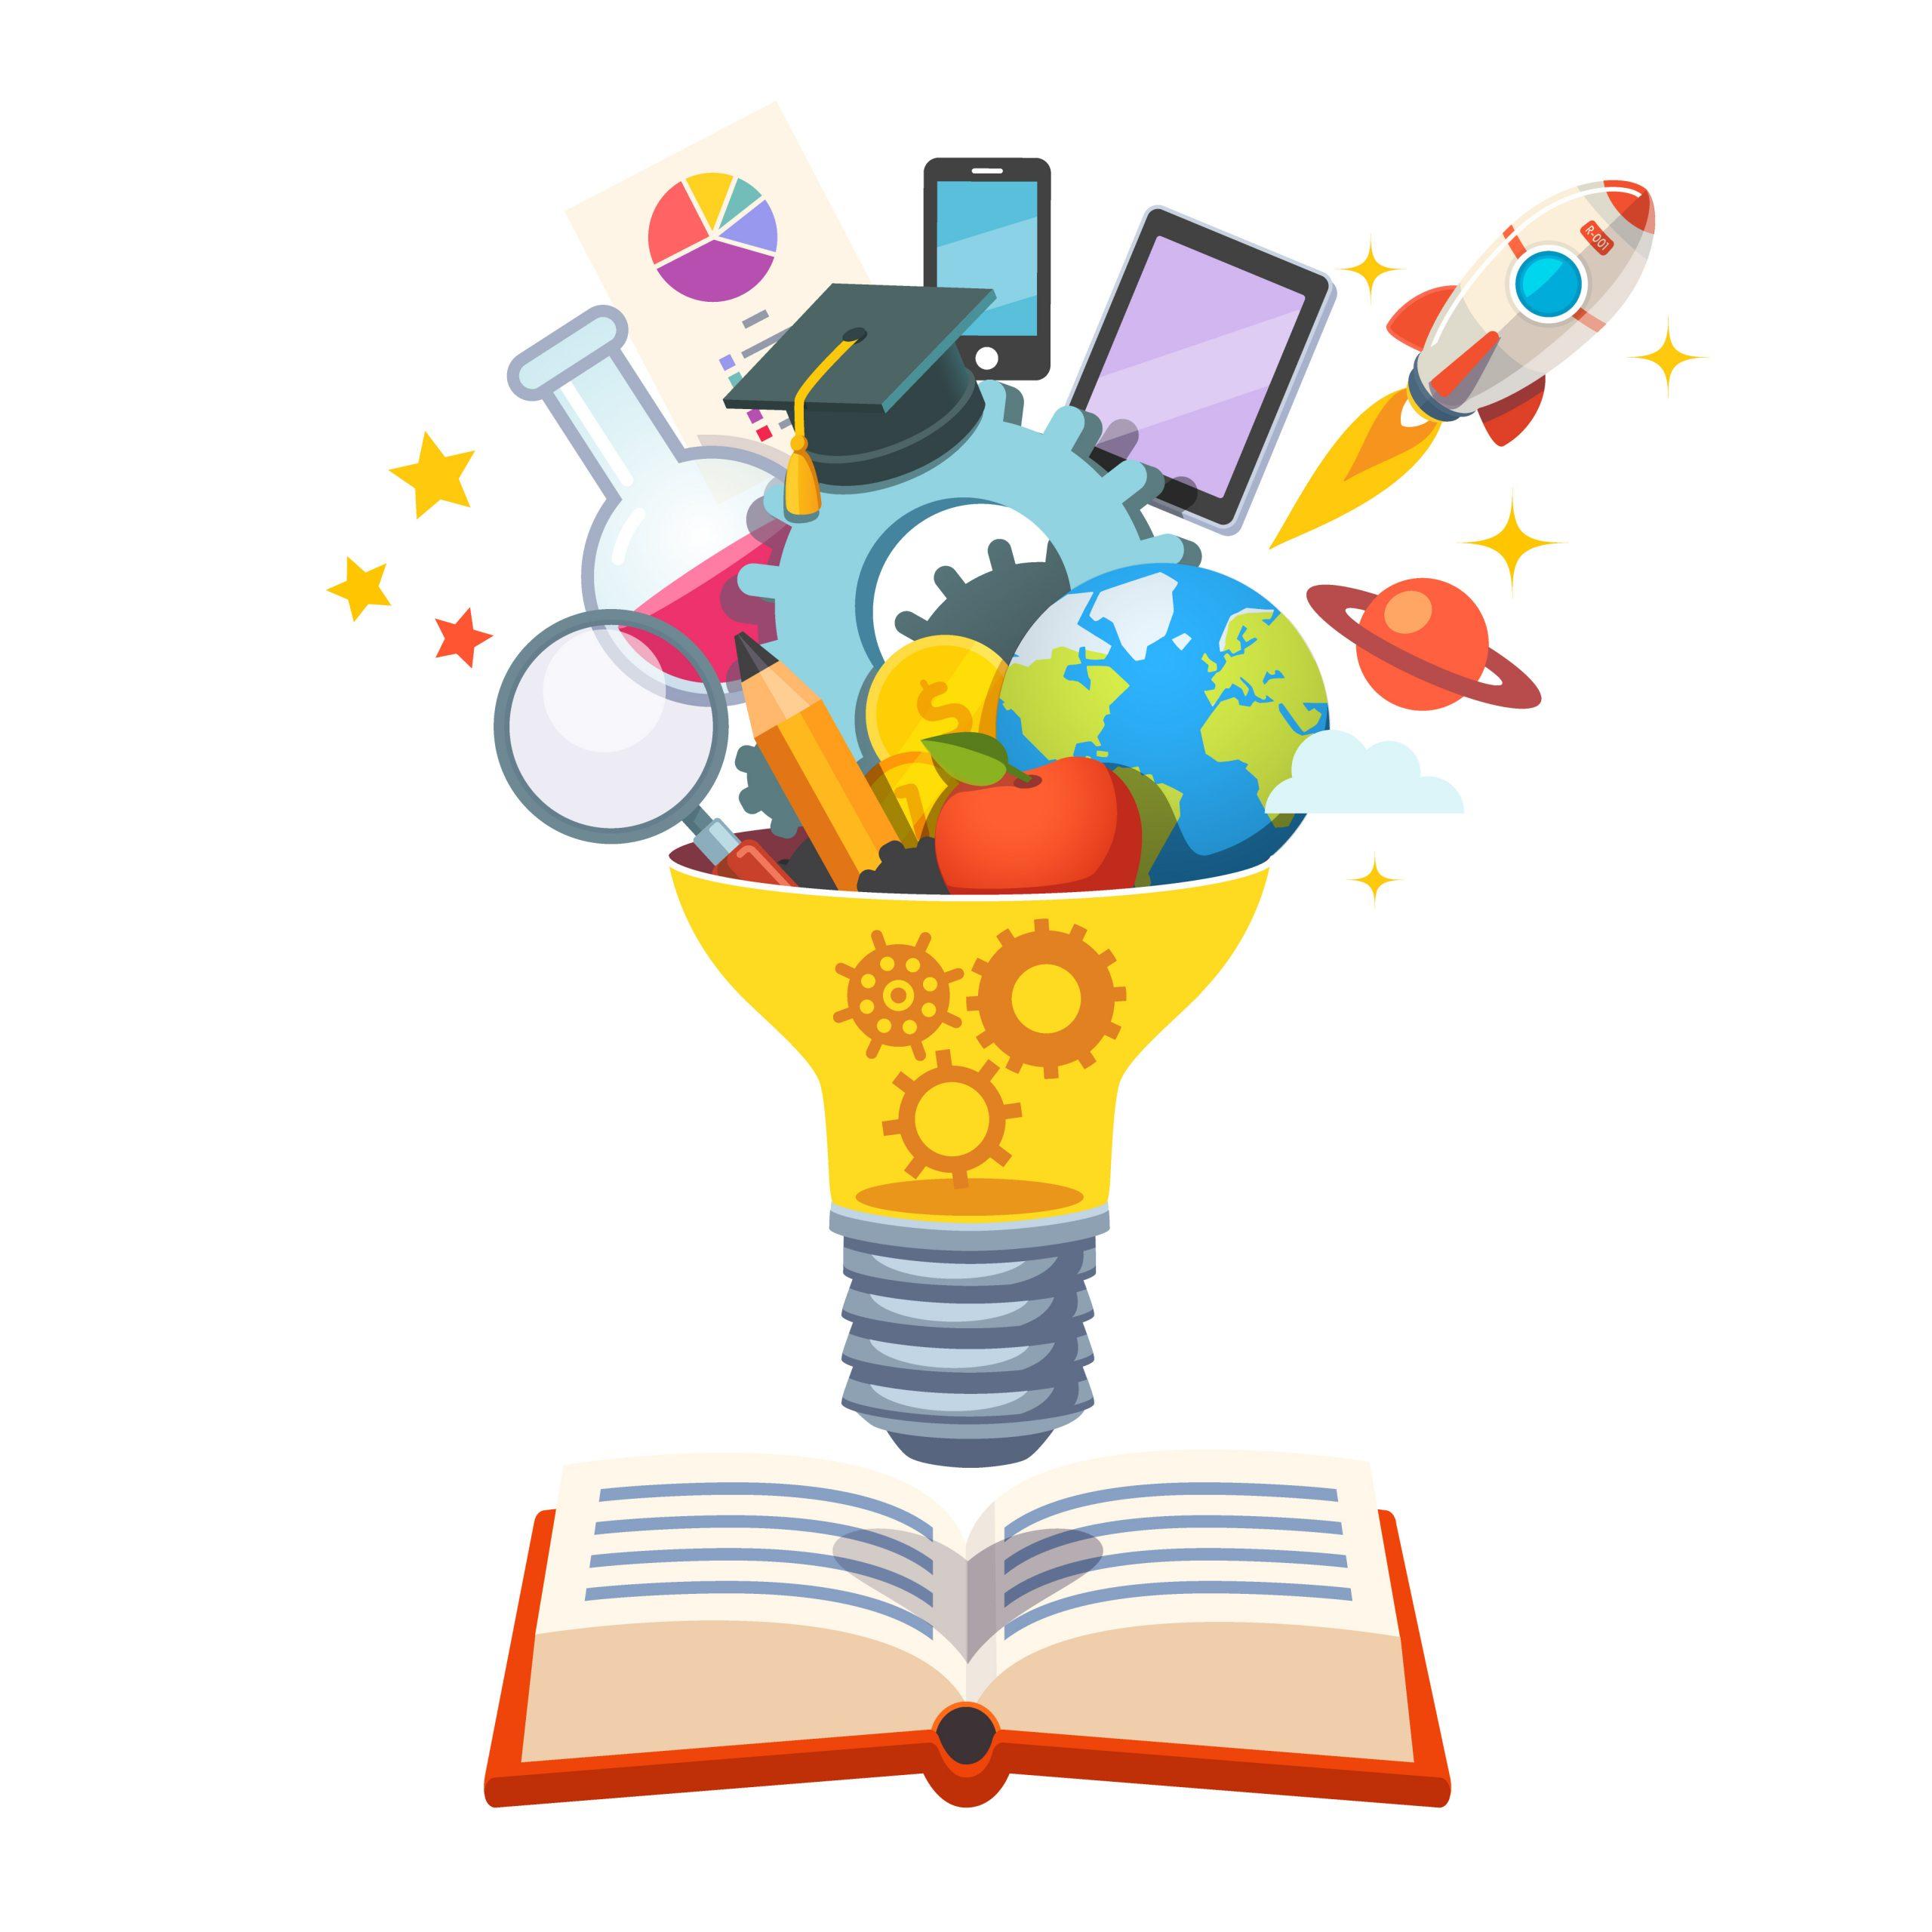 IP education - https://depositphotos.com/88739194/stock-illustration-light-bulb-with-gears-inside.html